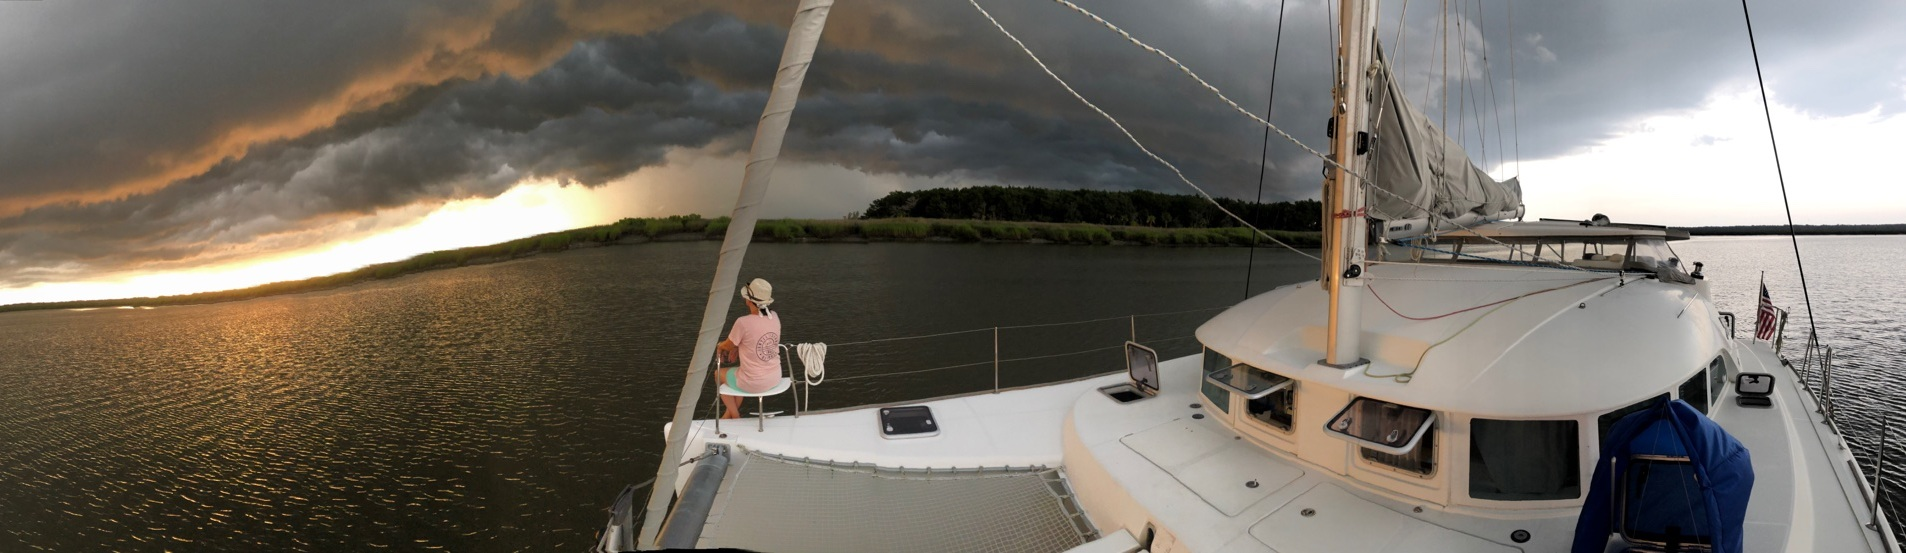 Storm-on-the-ICW.jpeg